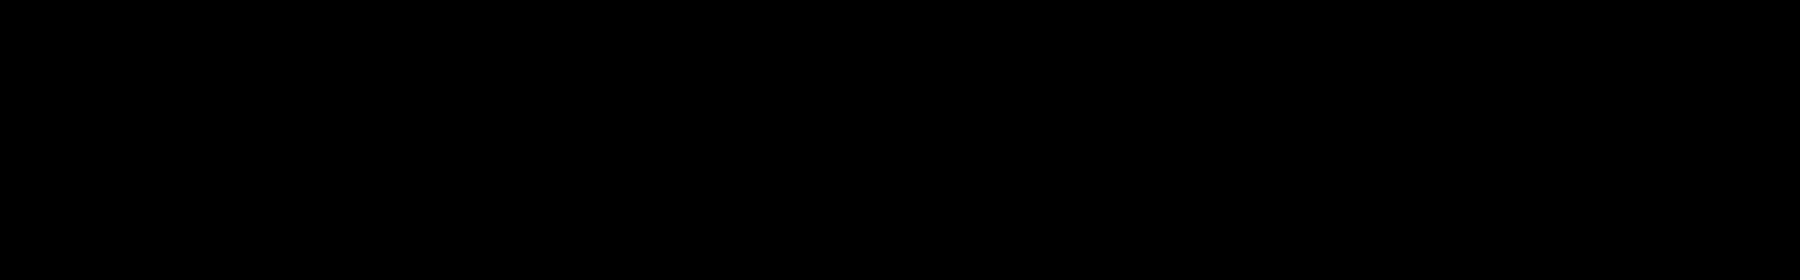 Major Reggaeton audio waveform